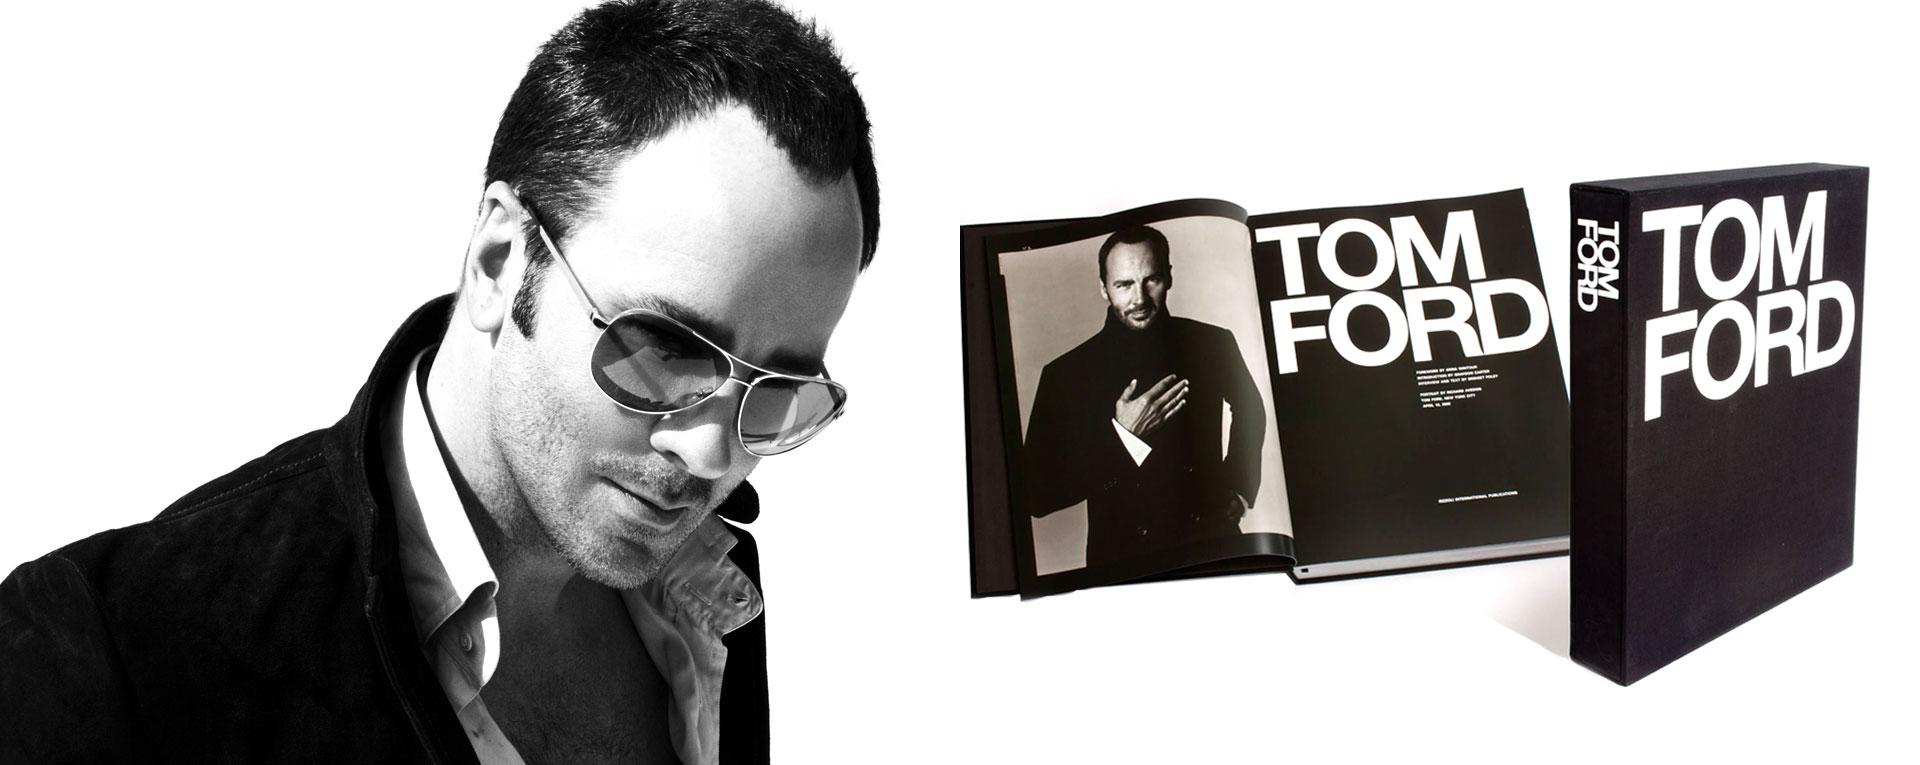 TomFord 5 9 1 - تام فورد Tom Ford